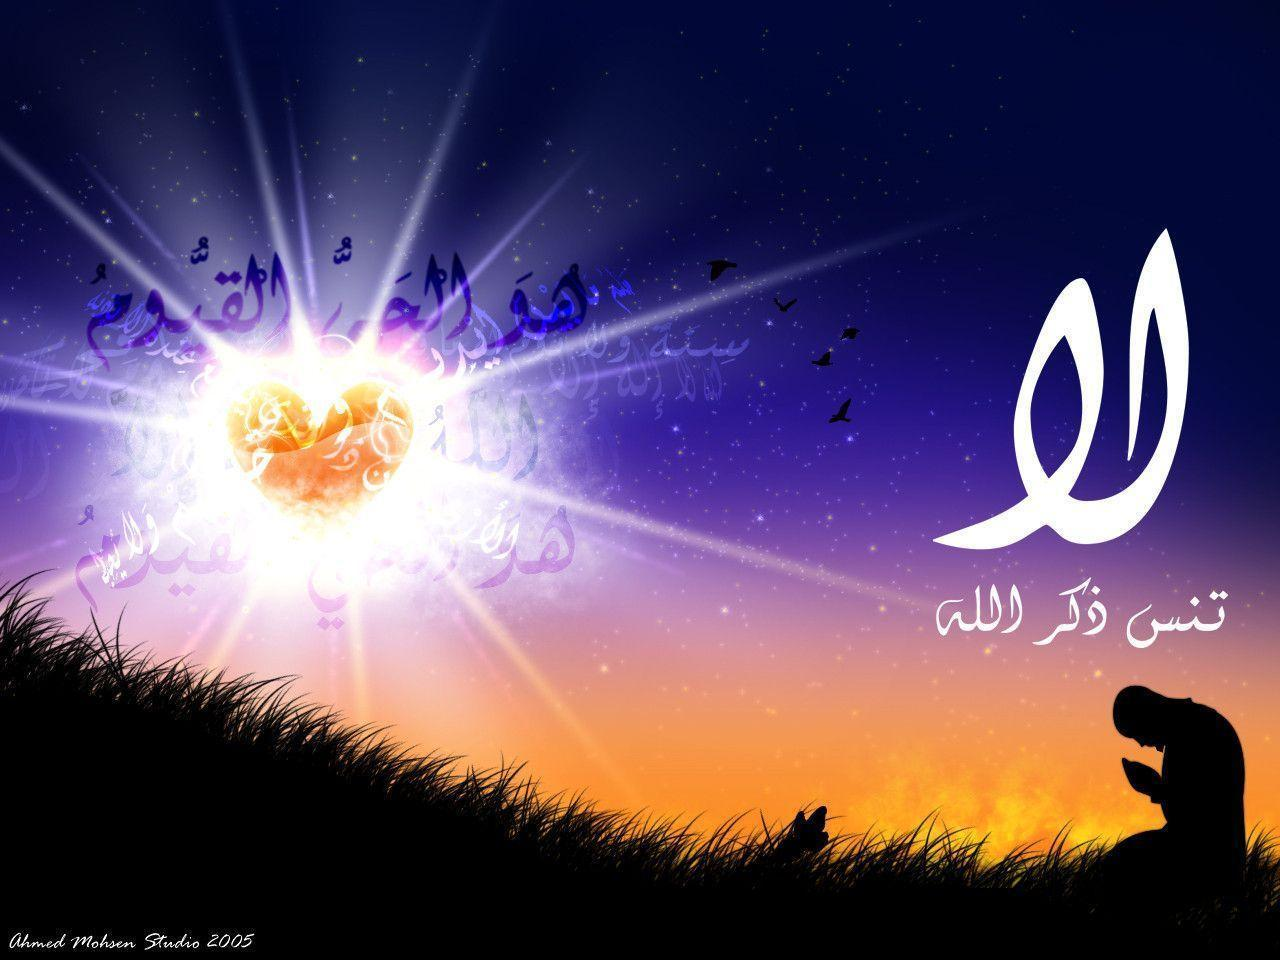 Wallpaper Allah 3d | Free Download Wallpaper | DaWallpaperz